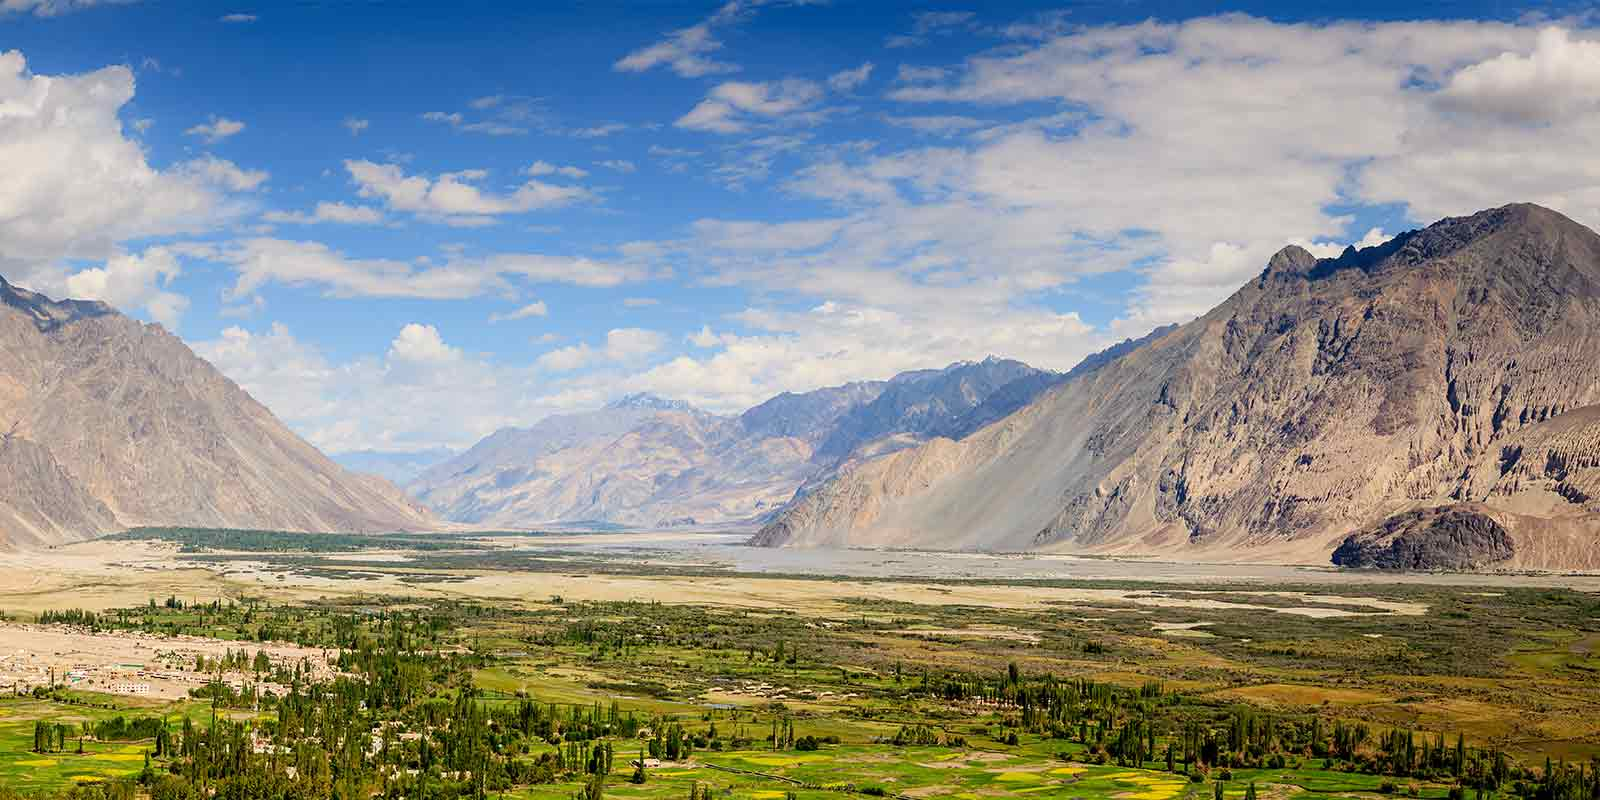 Mountain scenery in Nubra Valley, Ladakh, India